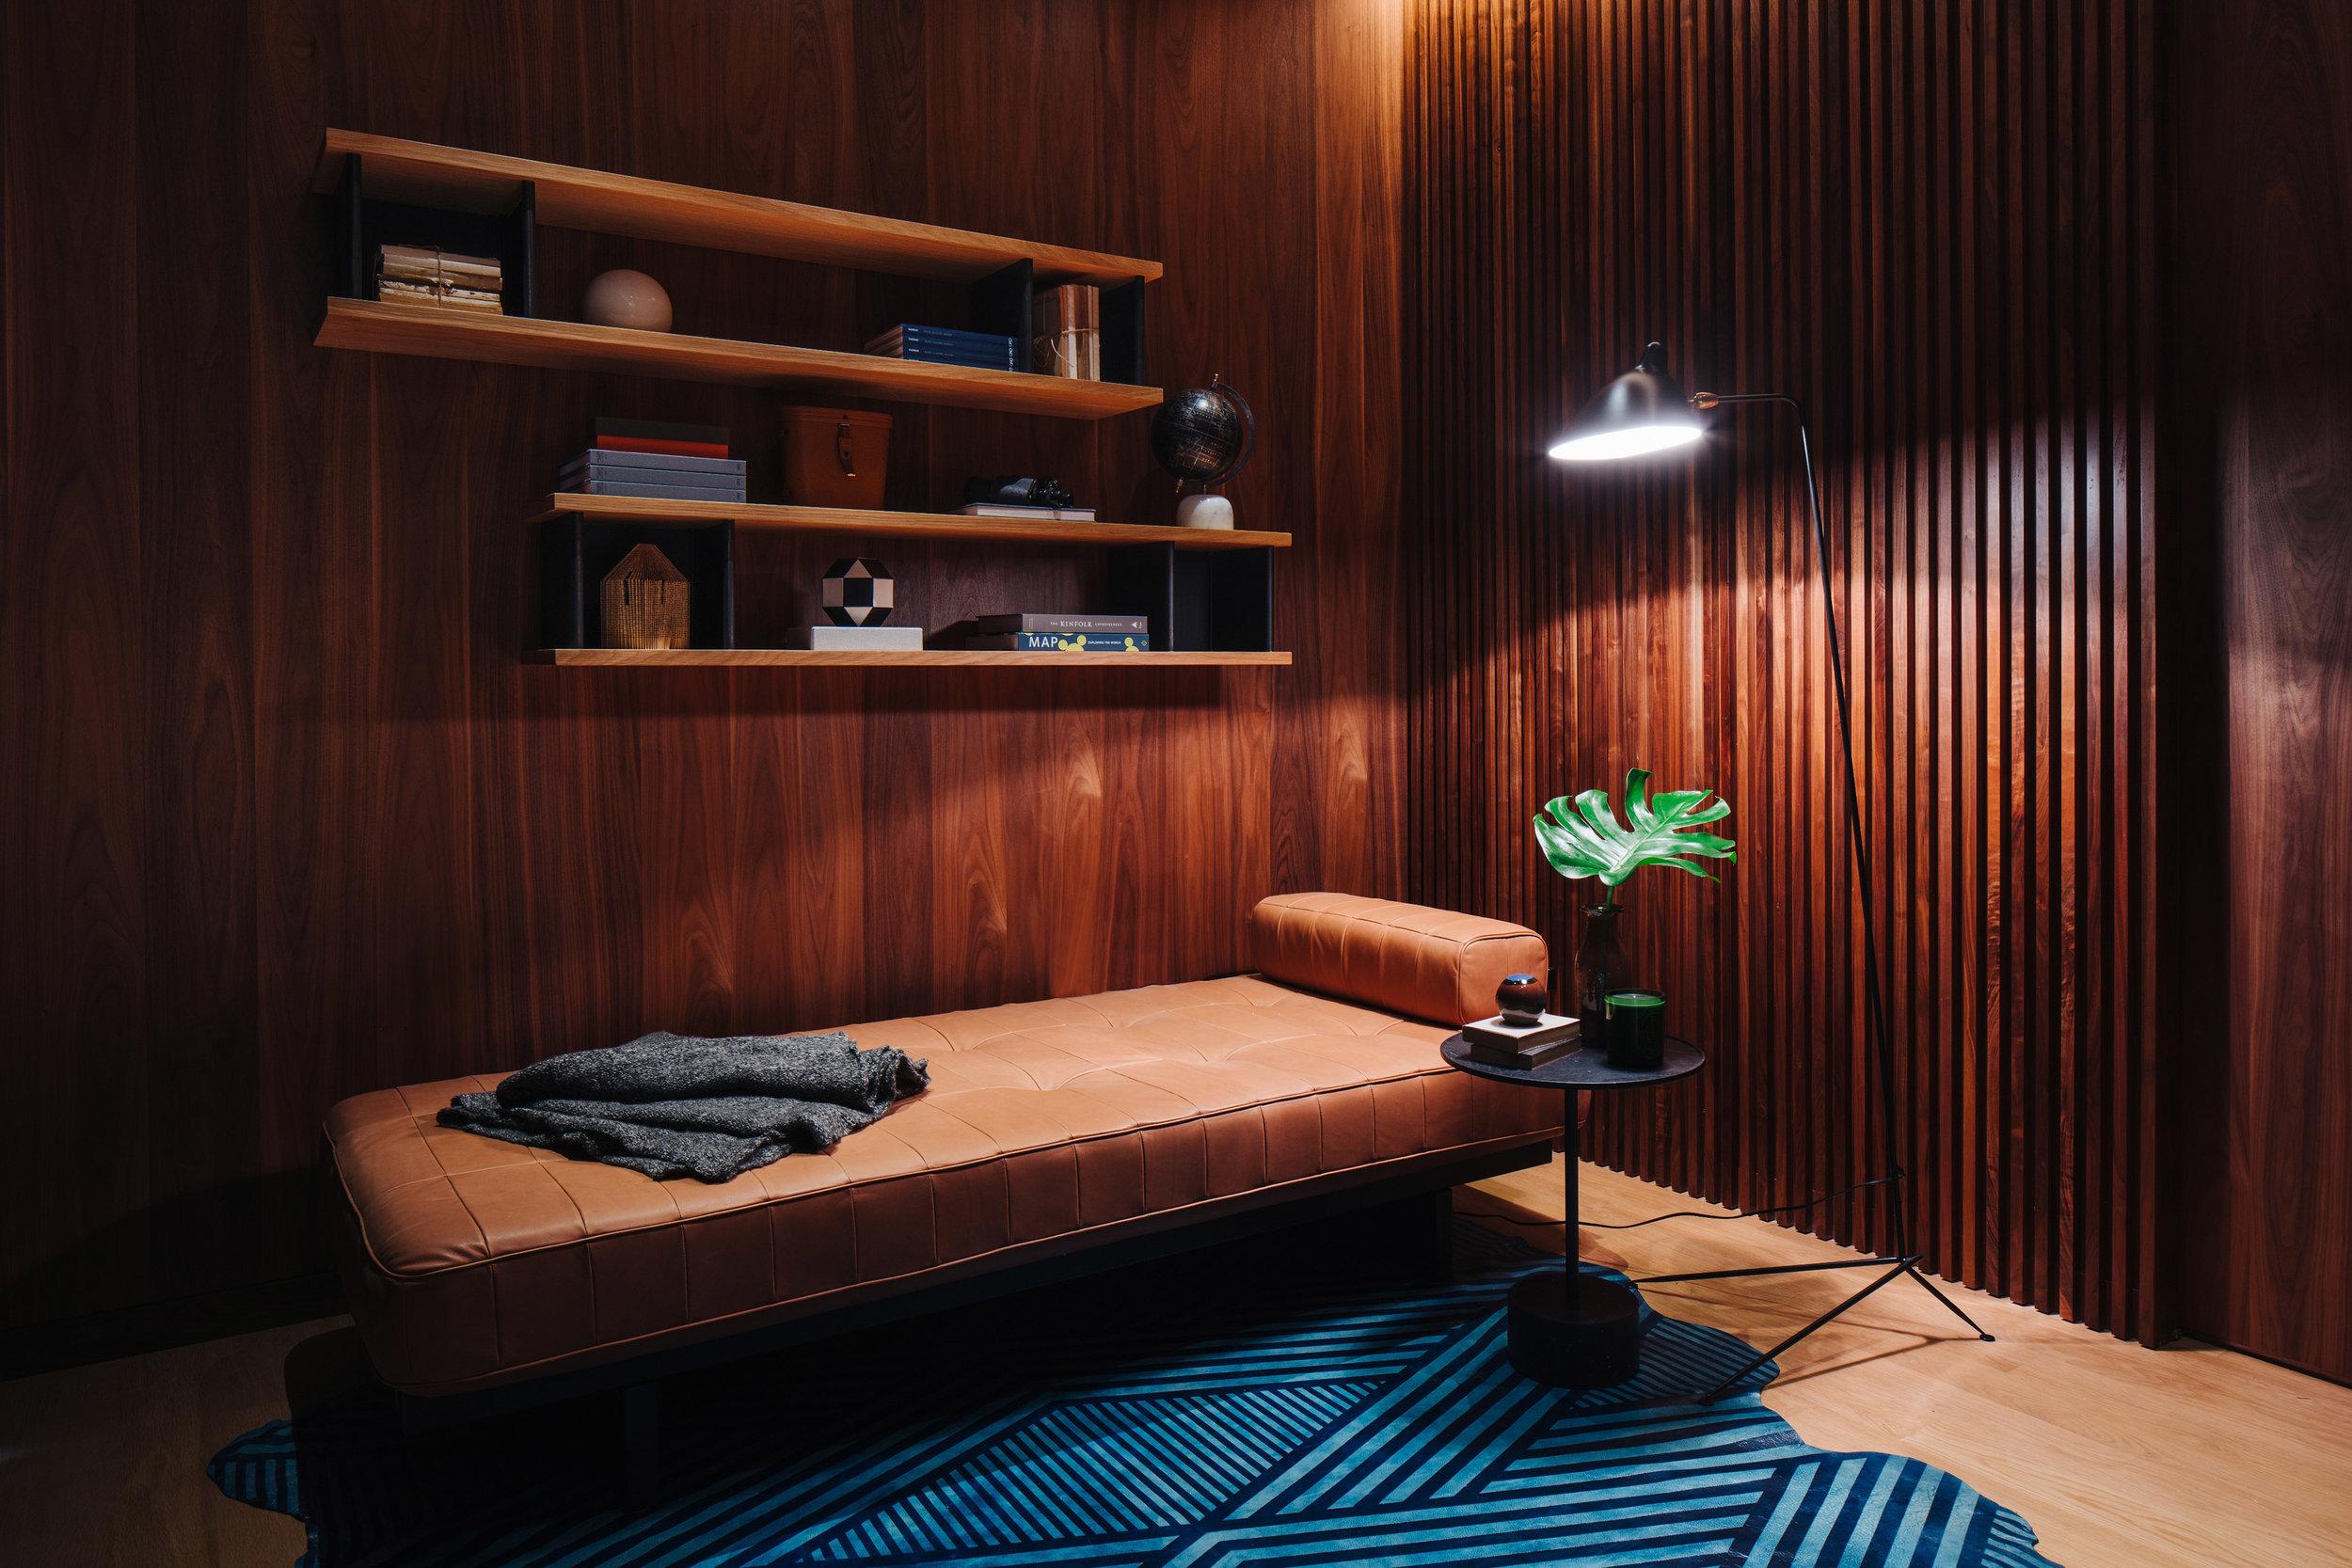 Marina One 3 Bedroom Showflat, Singapore 2018